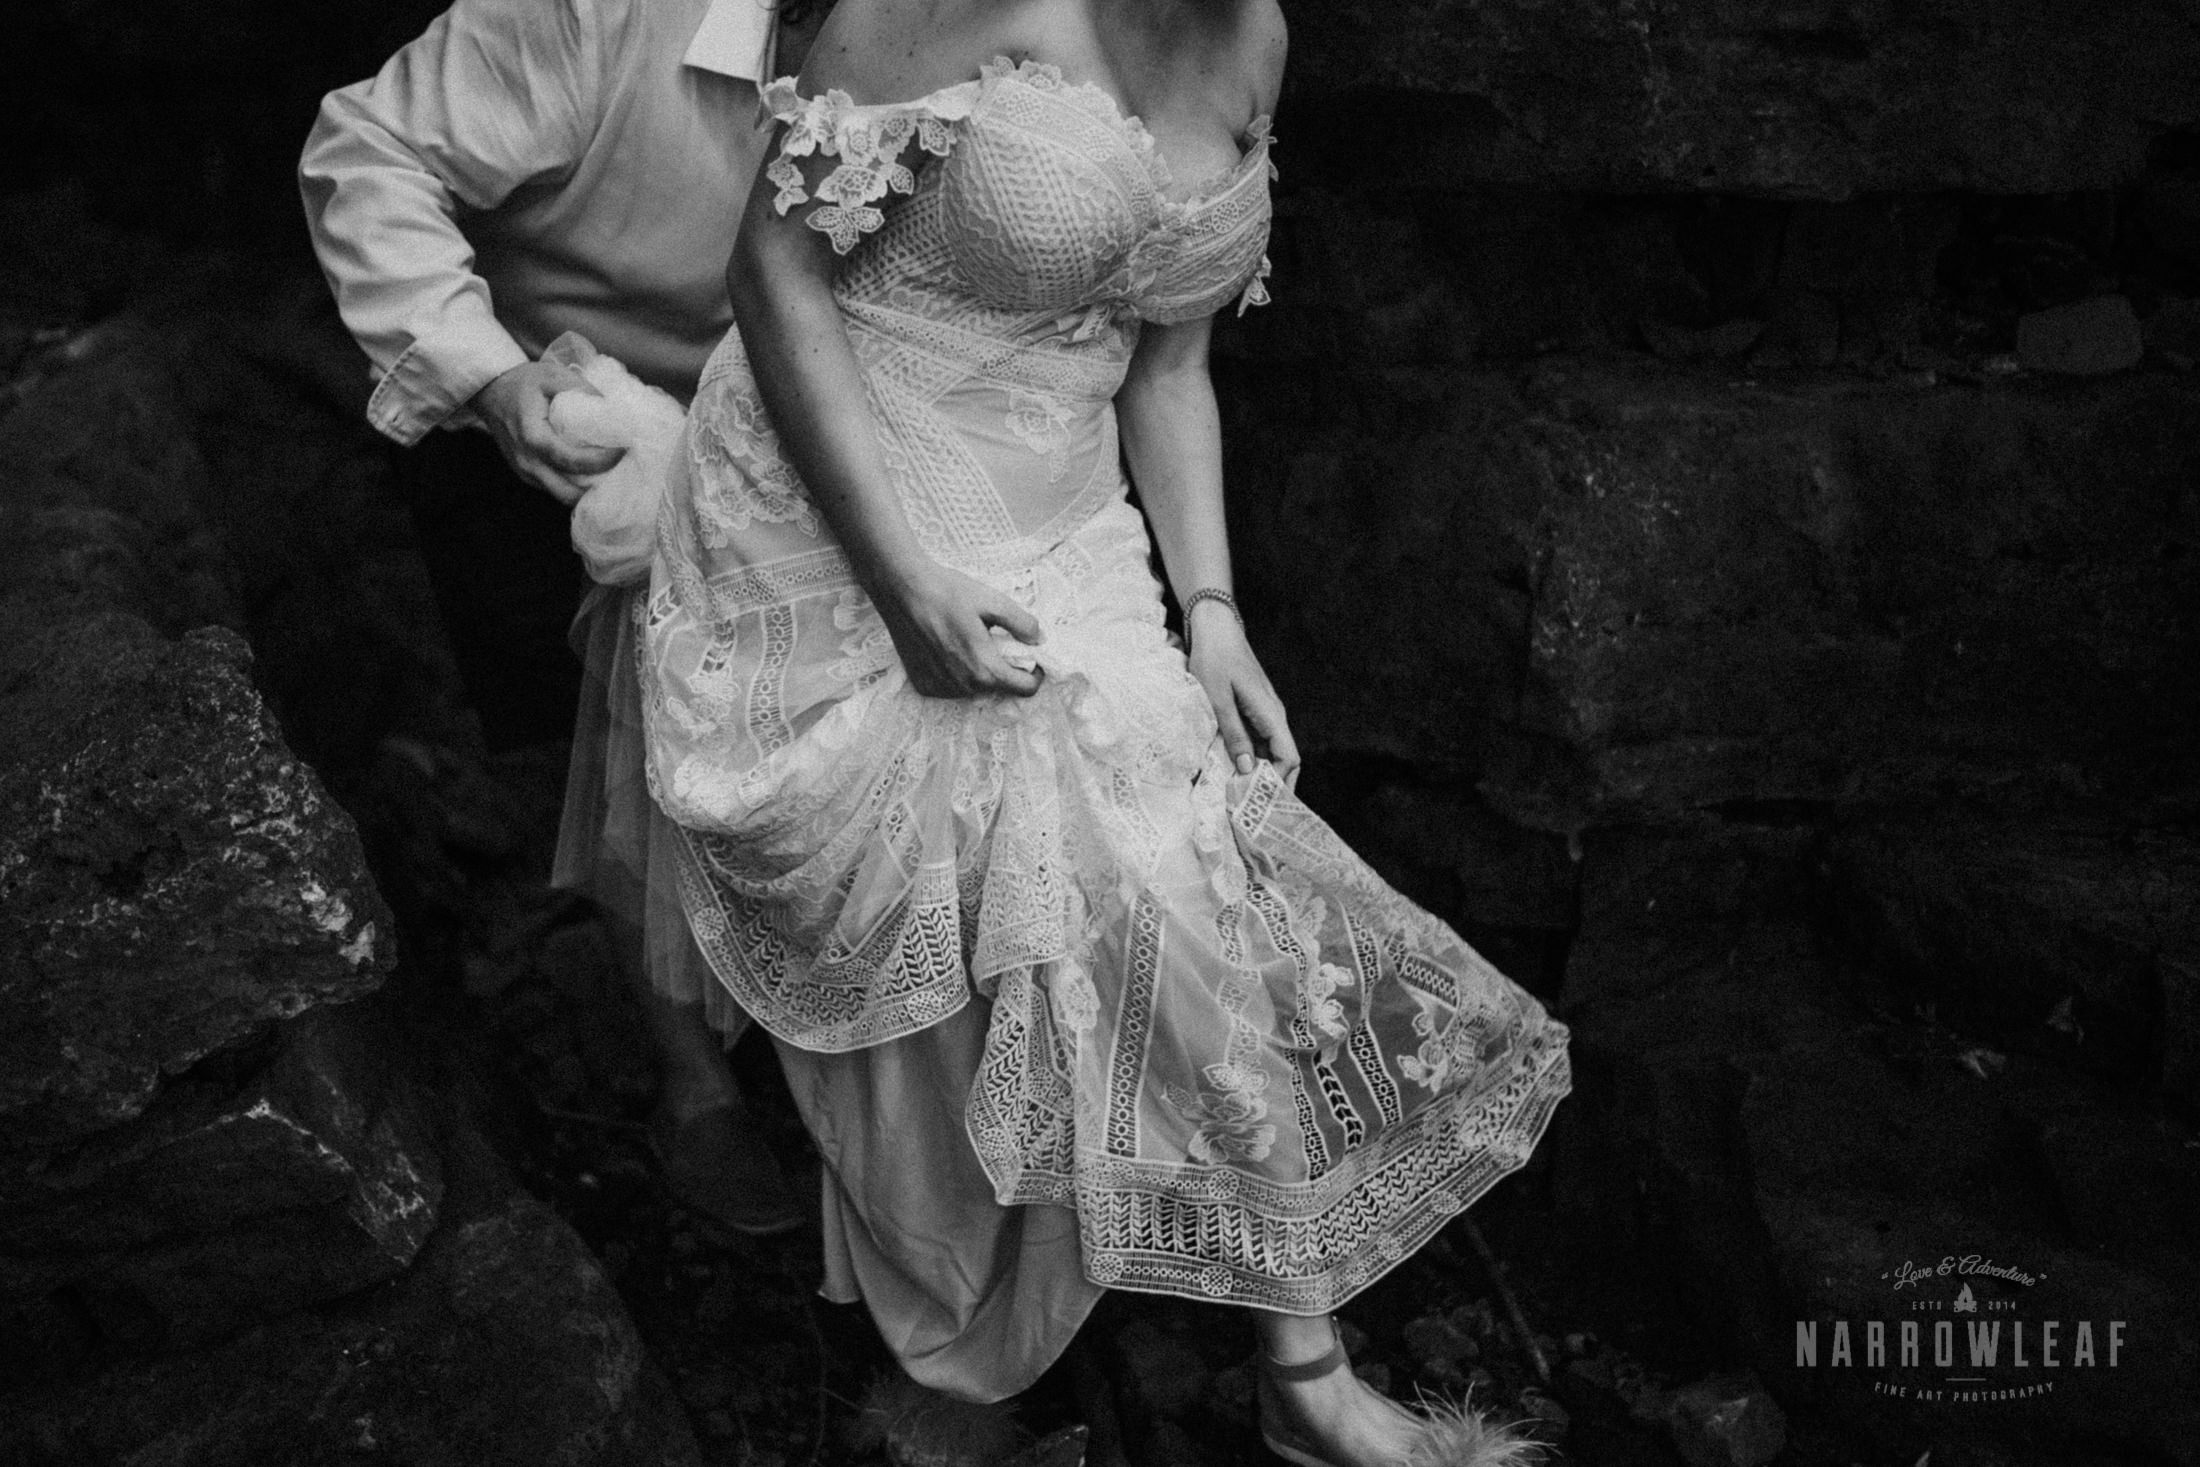 wisconsin-wedding-photographer-Narrowleaf_Love_and_Adventure_Photography-3067.jpg